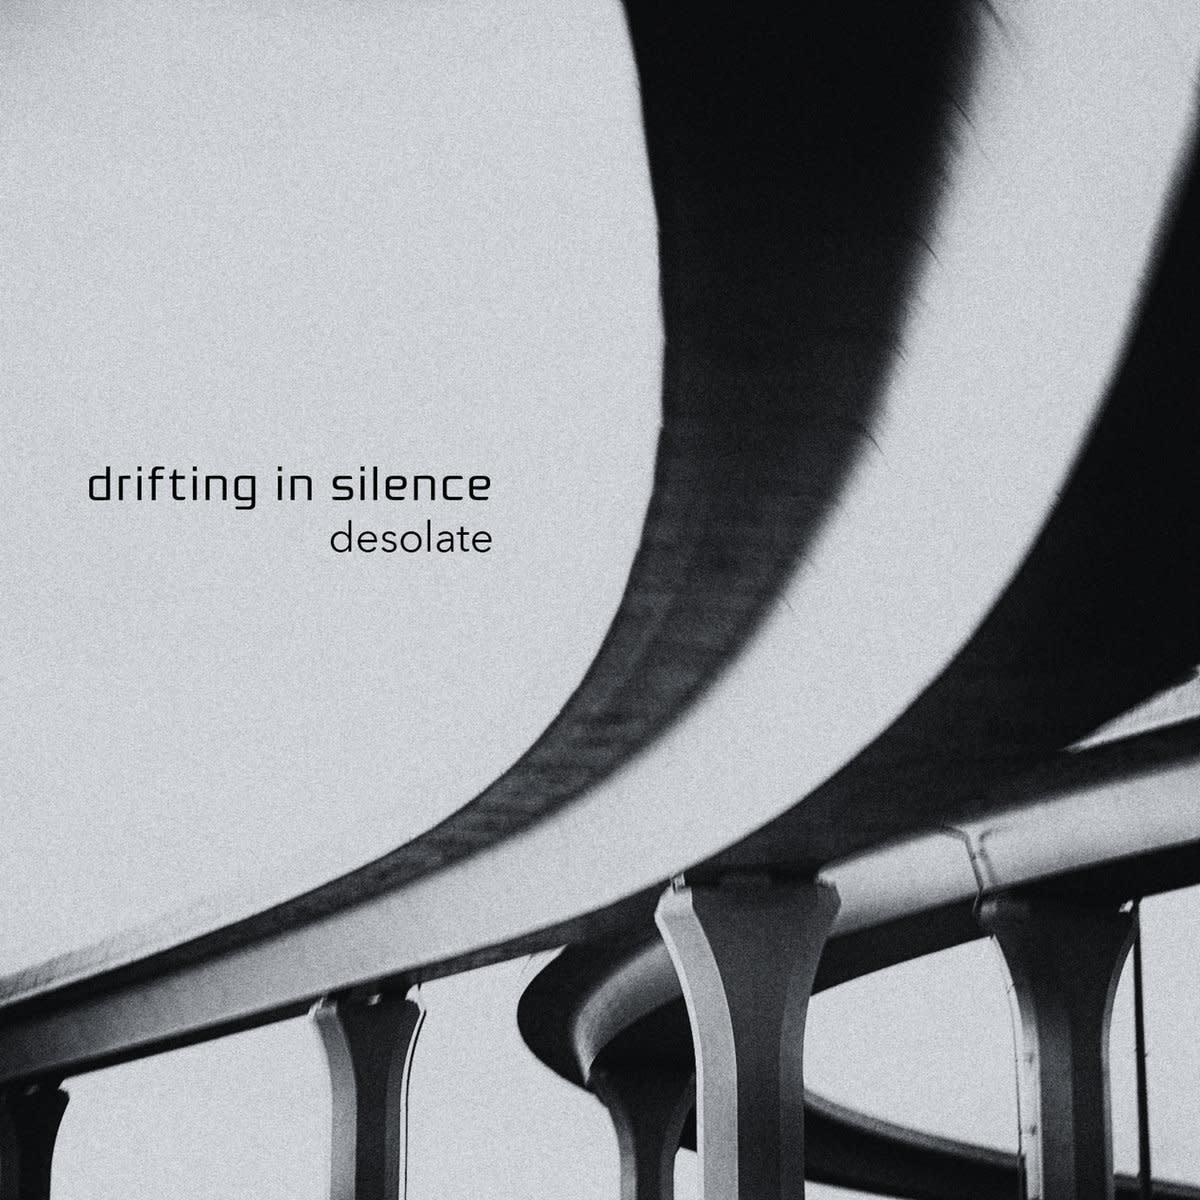 Drifting In Silence Desolate